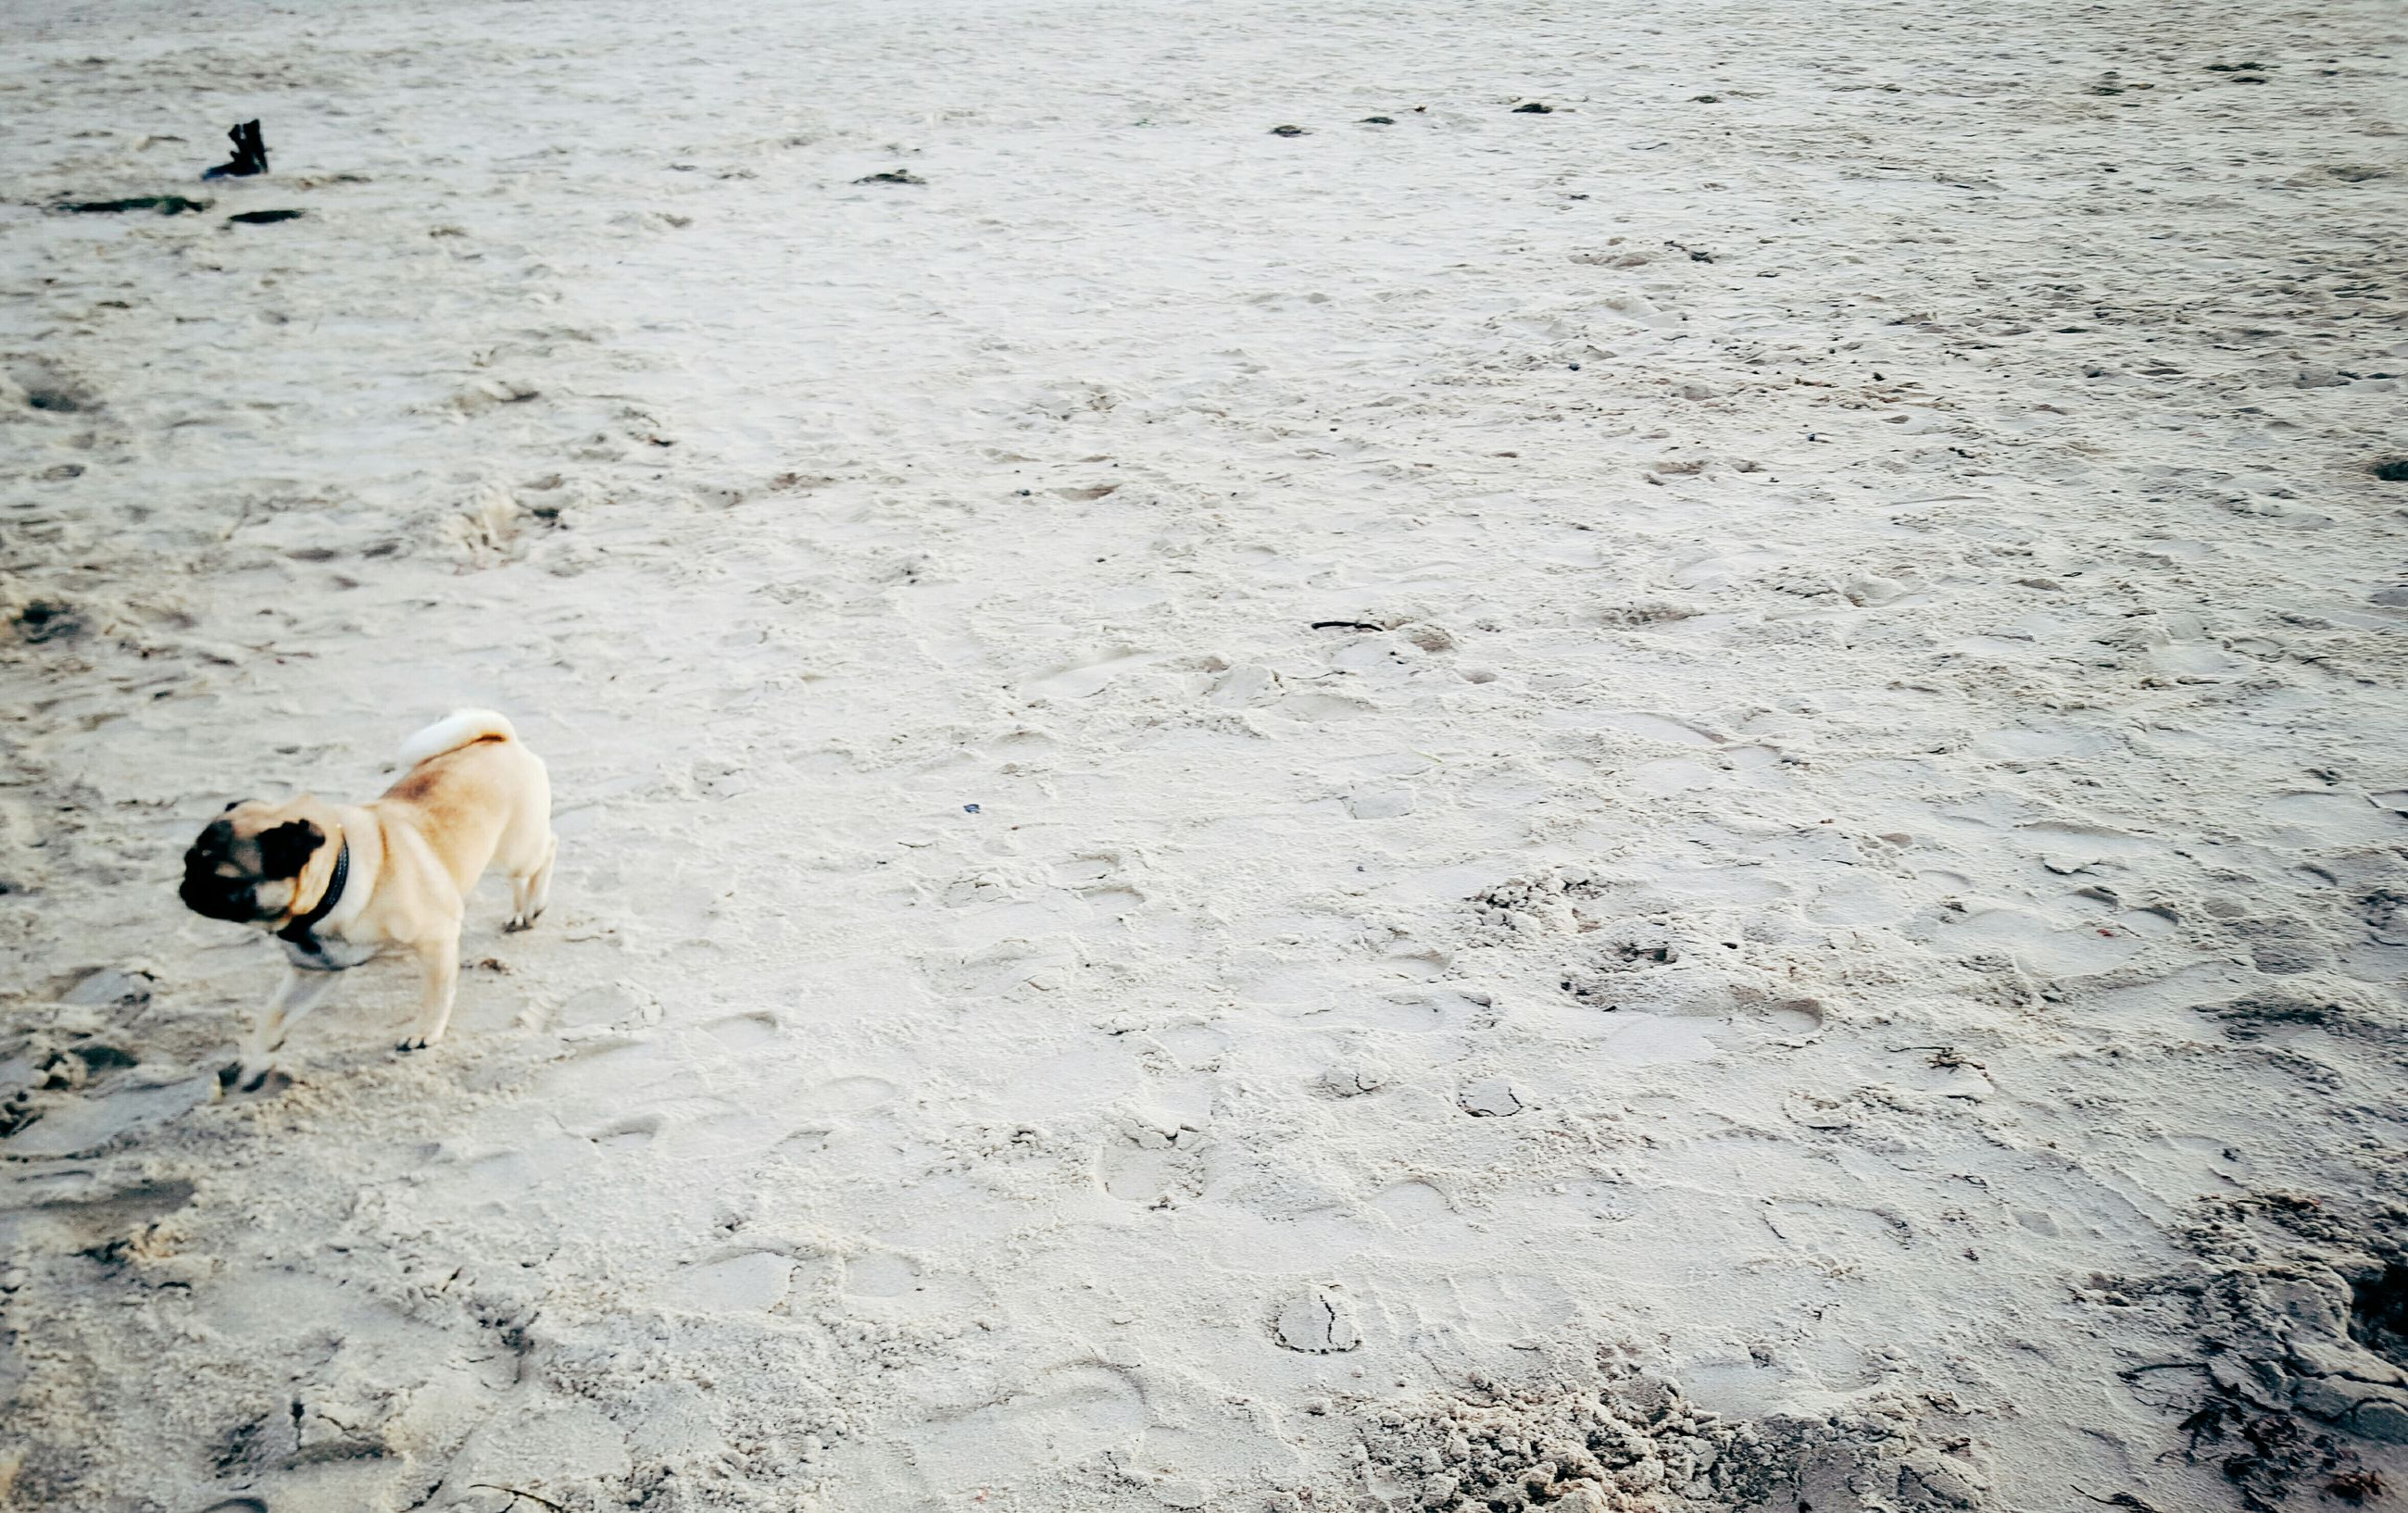 High angle view of pug on sand at beach